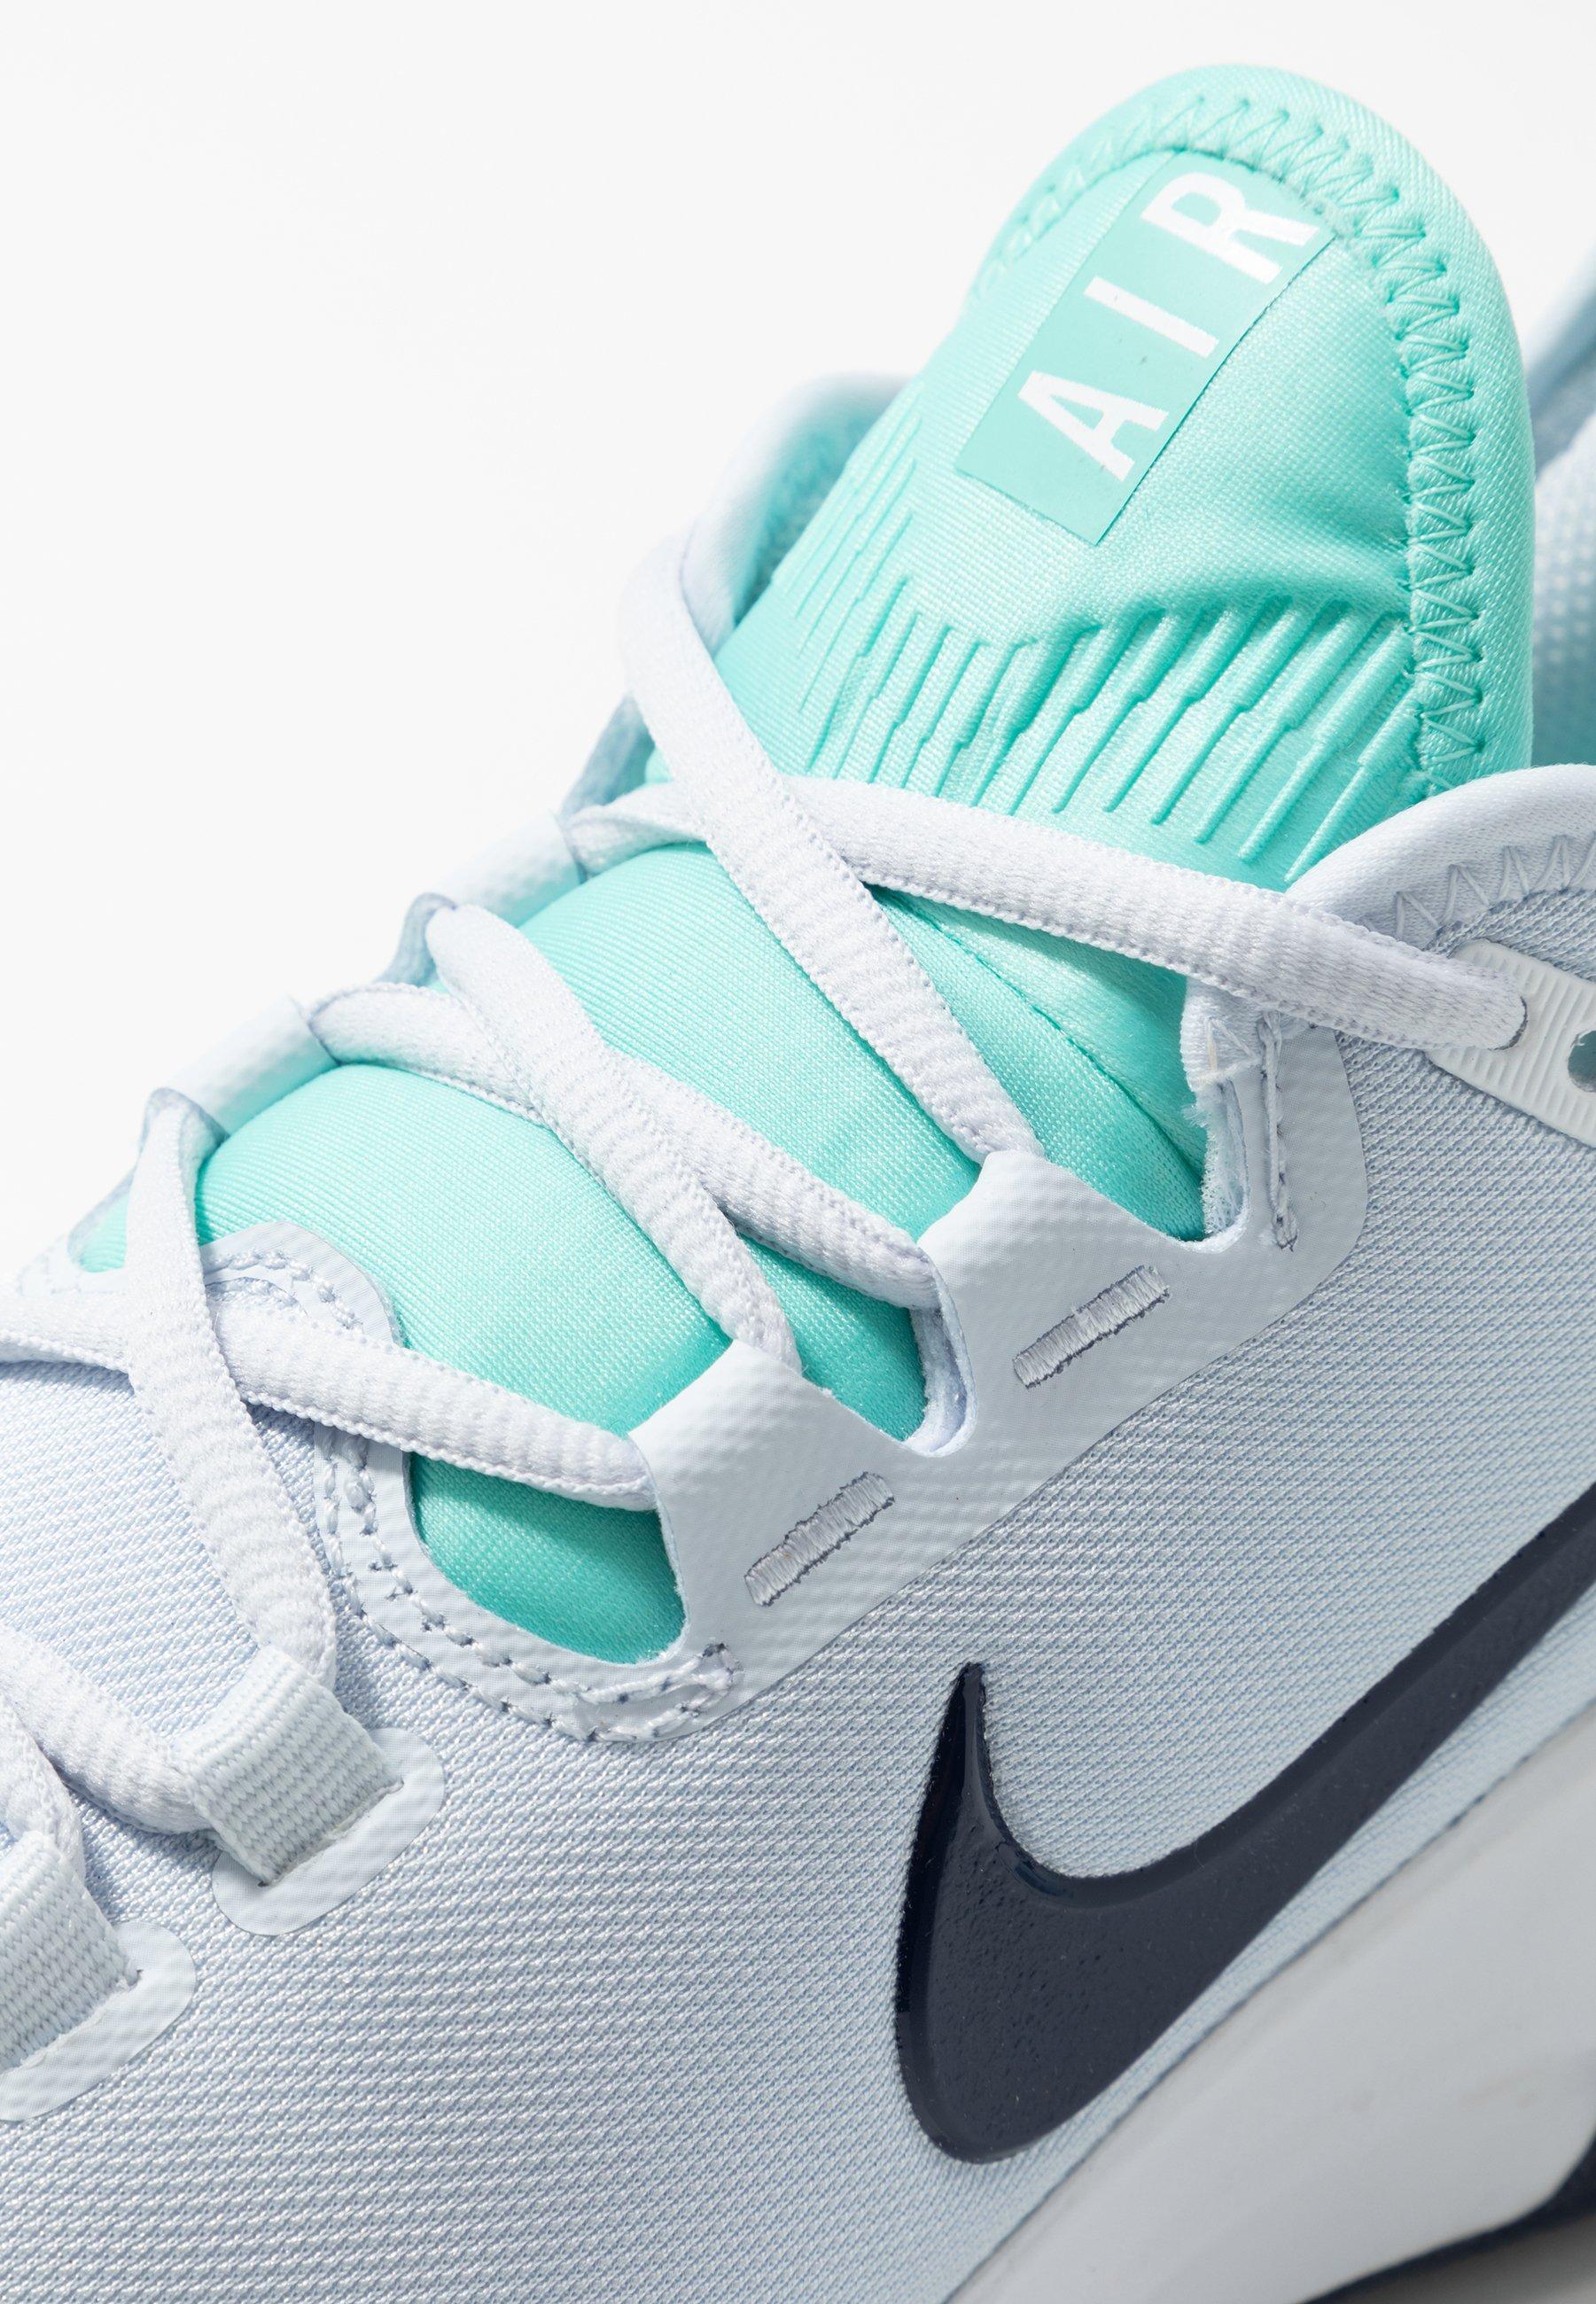 Nike Performance Clay court tennissko - metallic silver